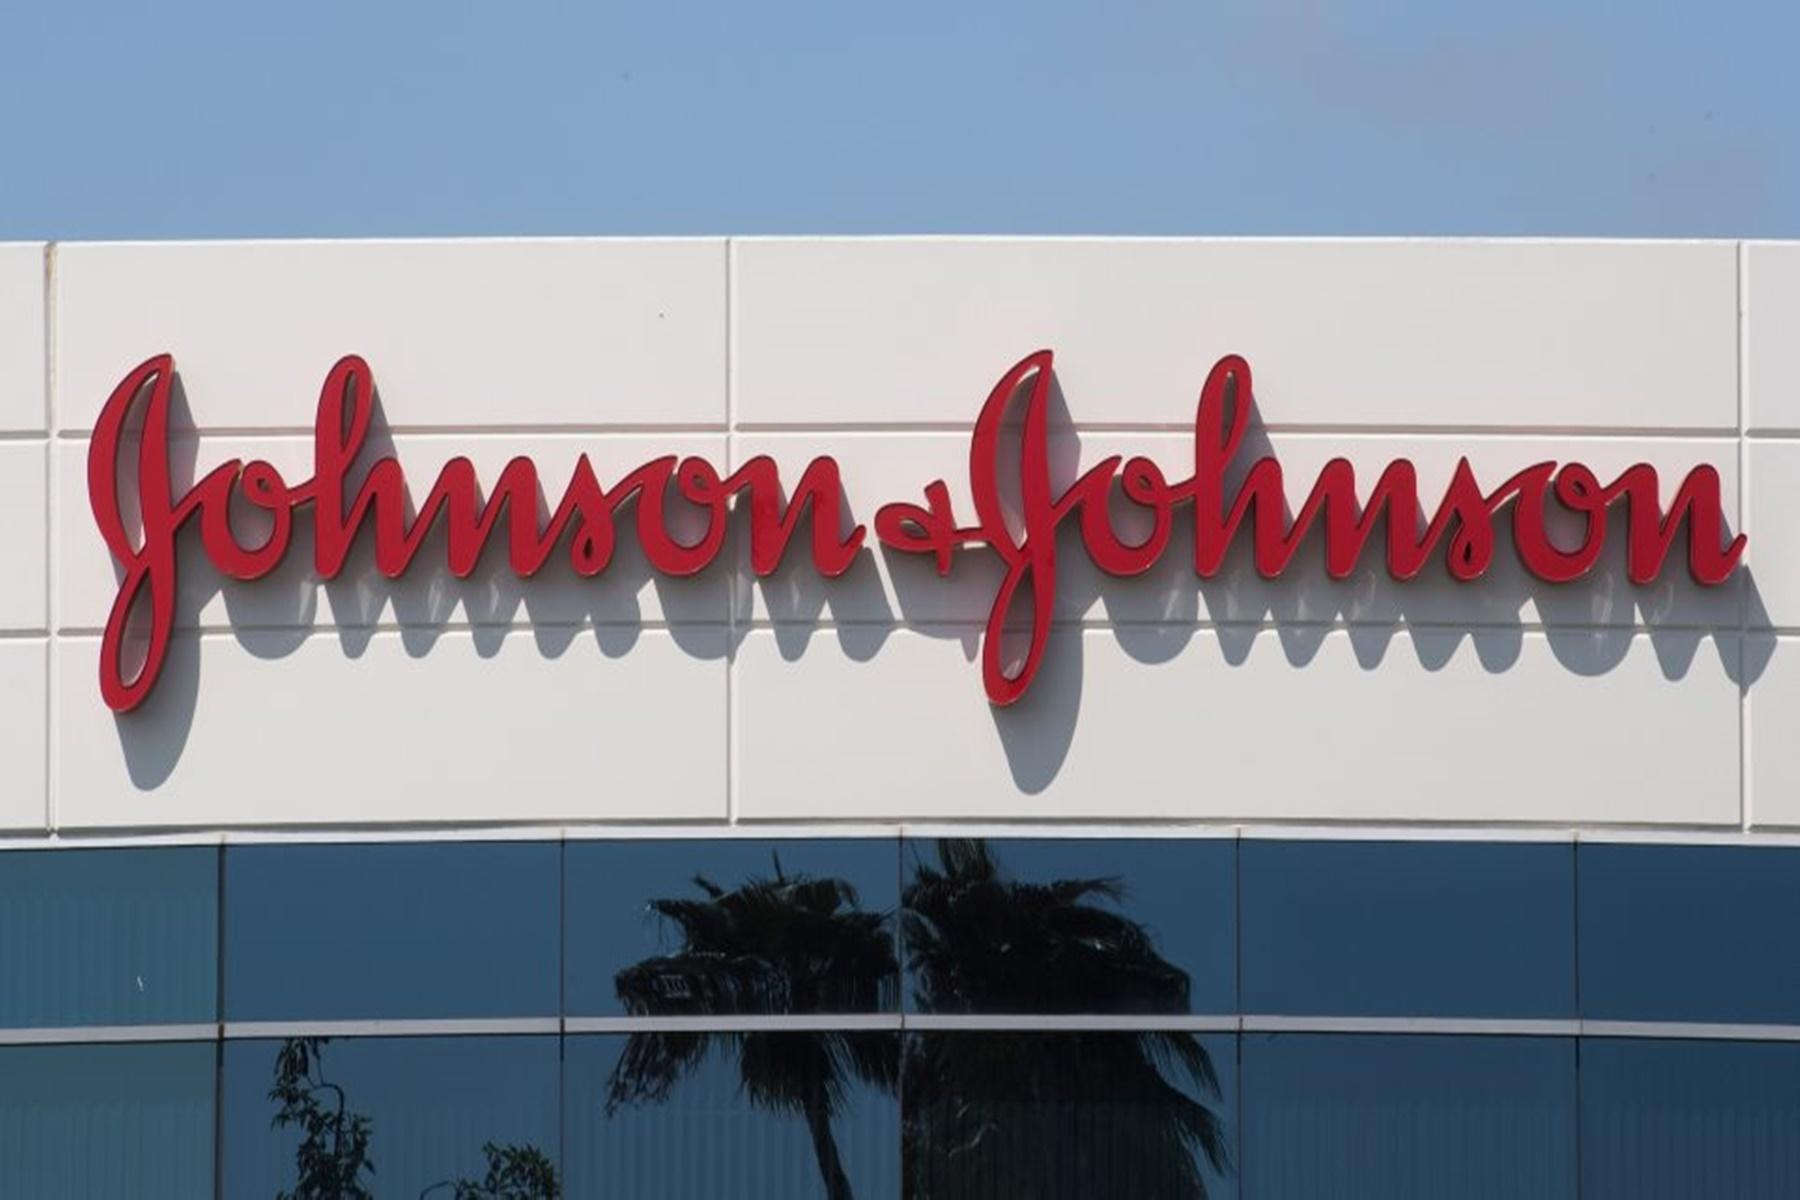 Johnson & johnson : Η κυτταρική ανοσία παραμένει και 8 μήνες μετά το εμβόλιο